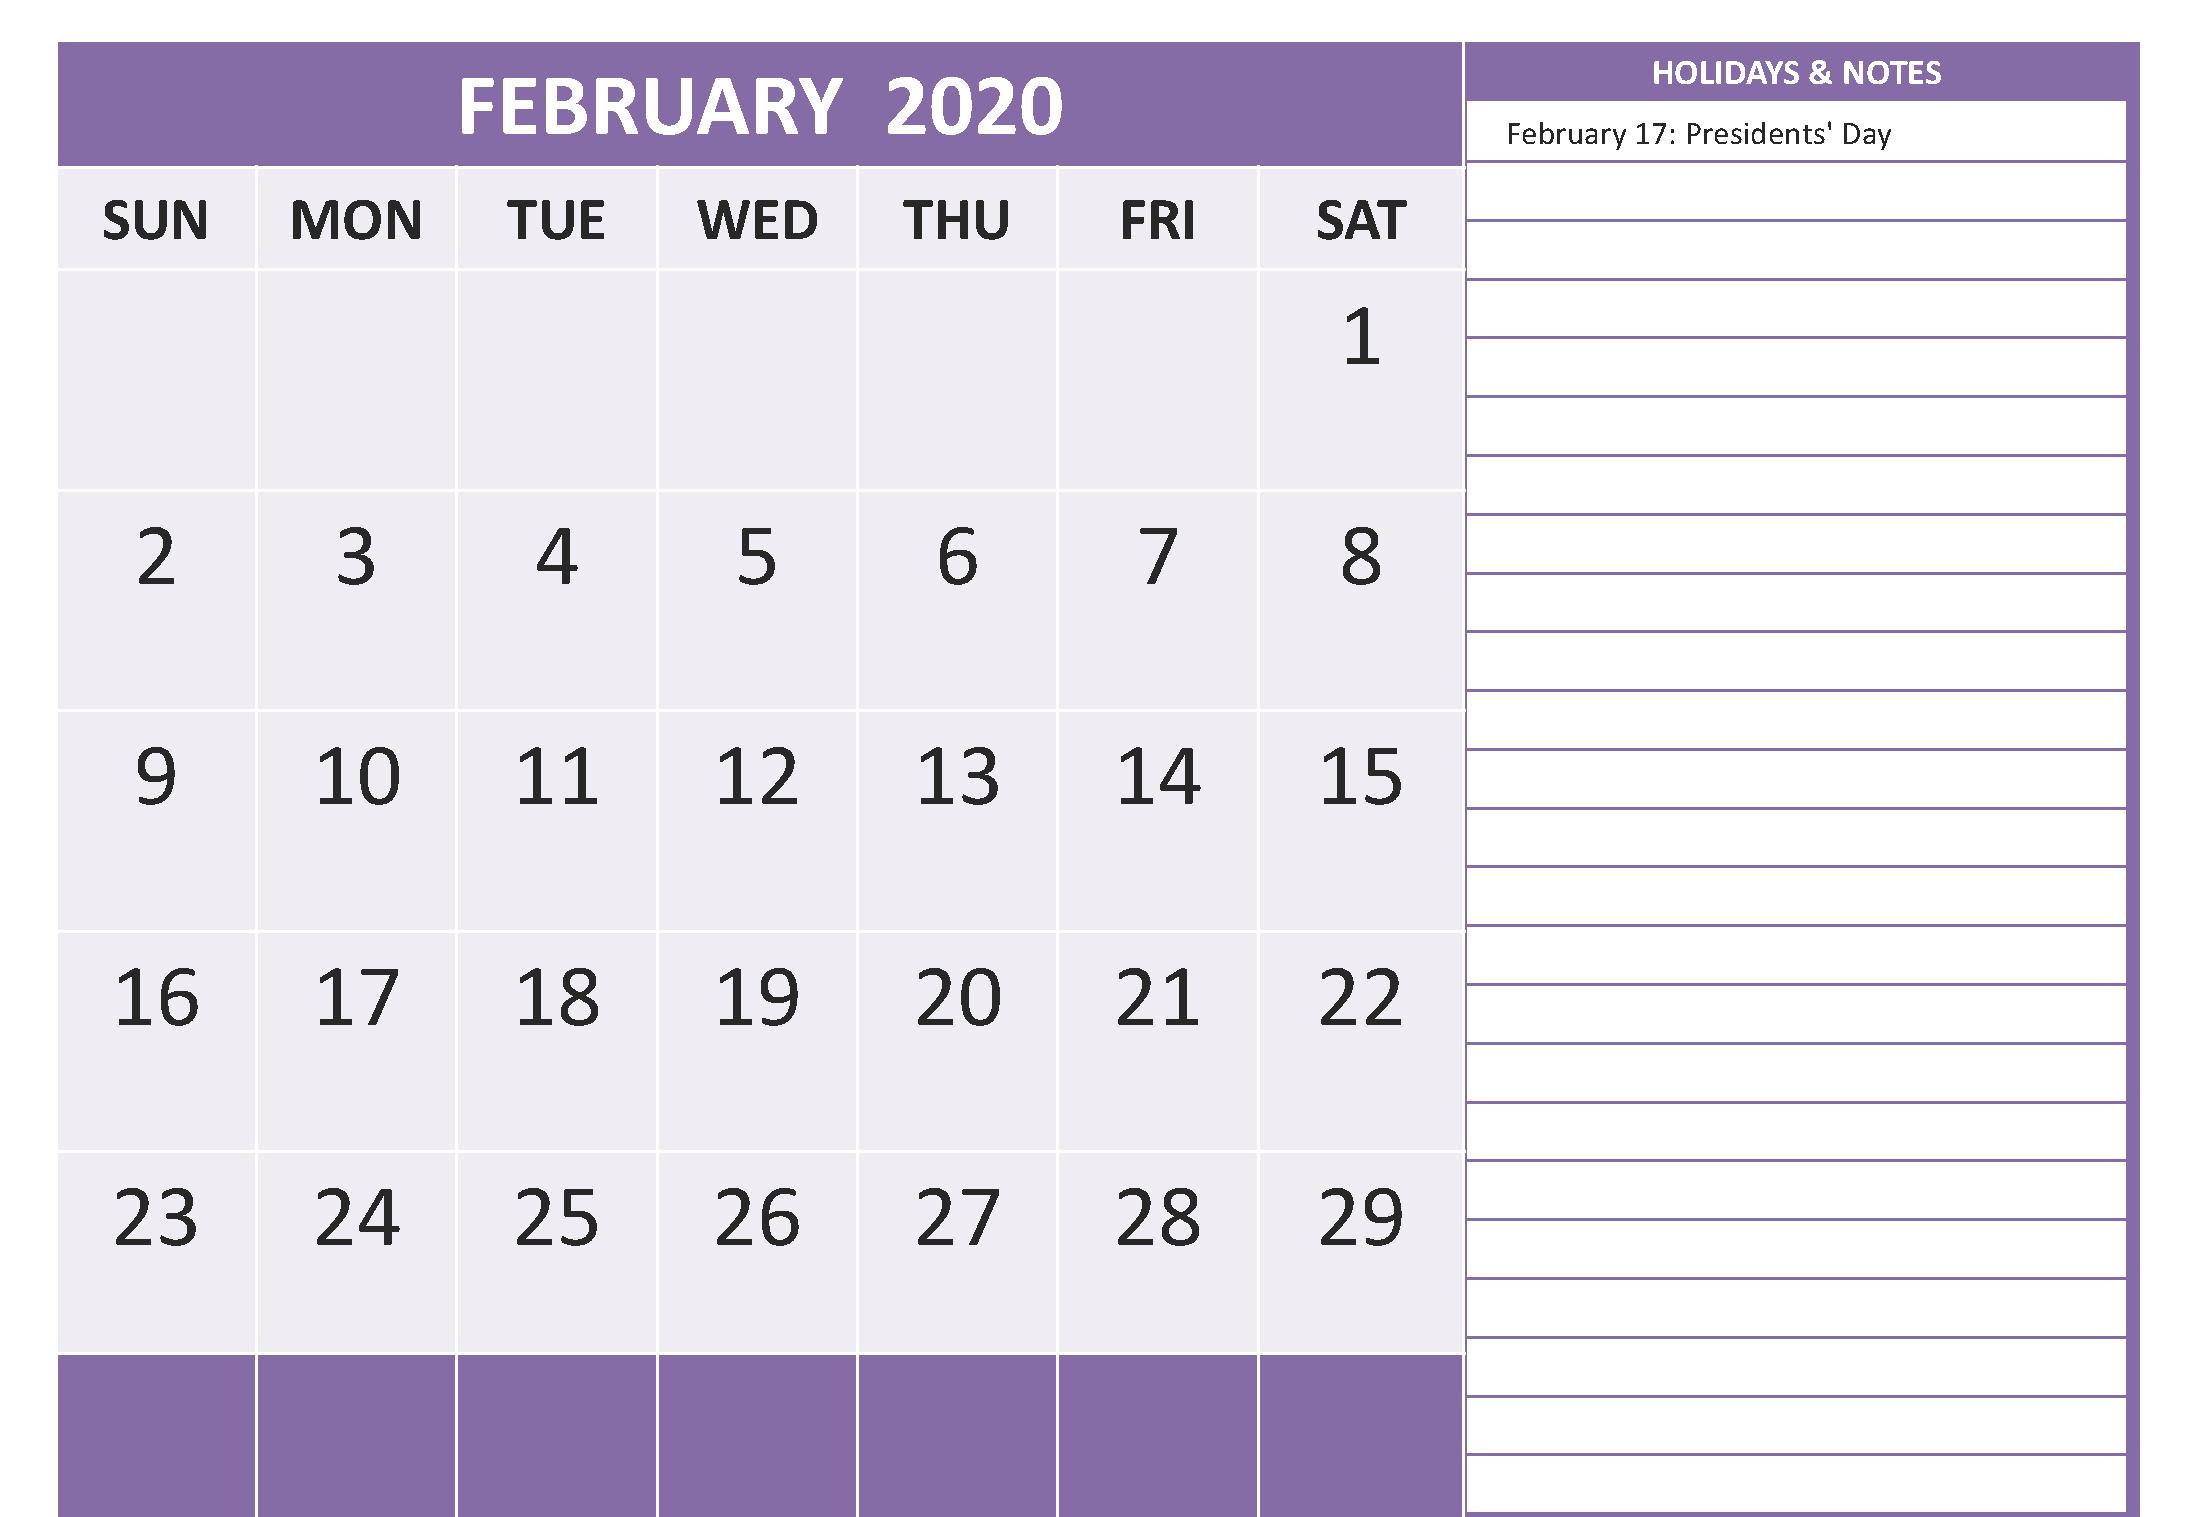 February 2020 Calendar Holidays with Notes